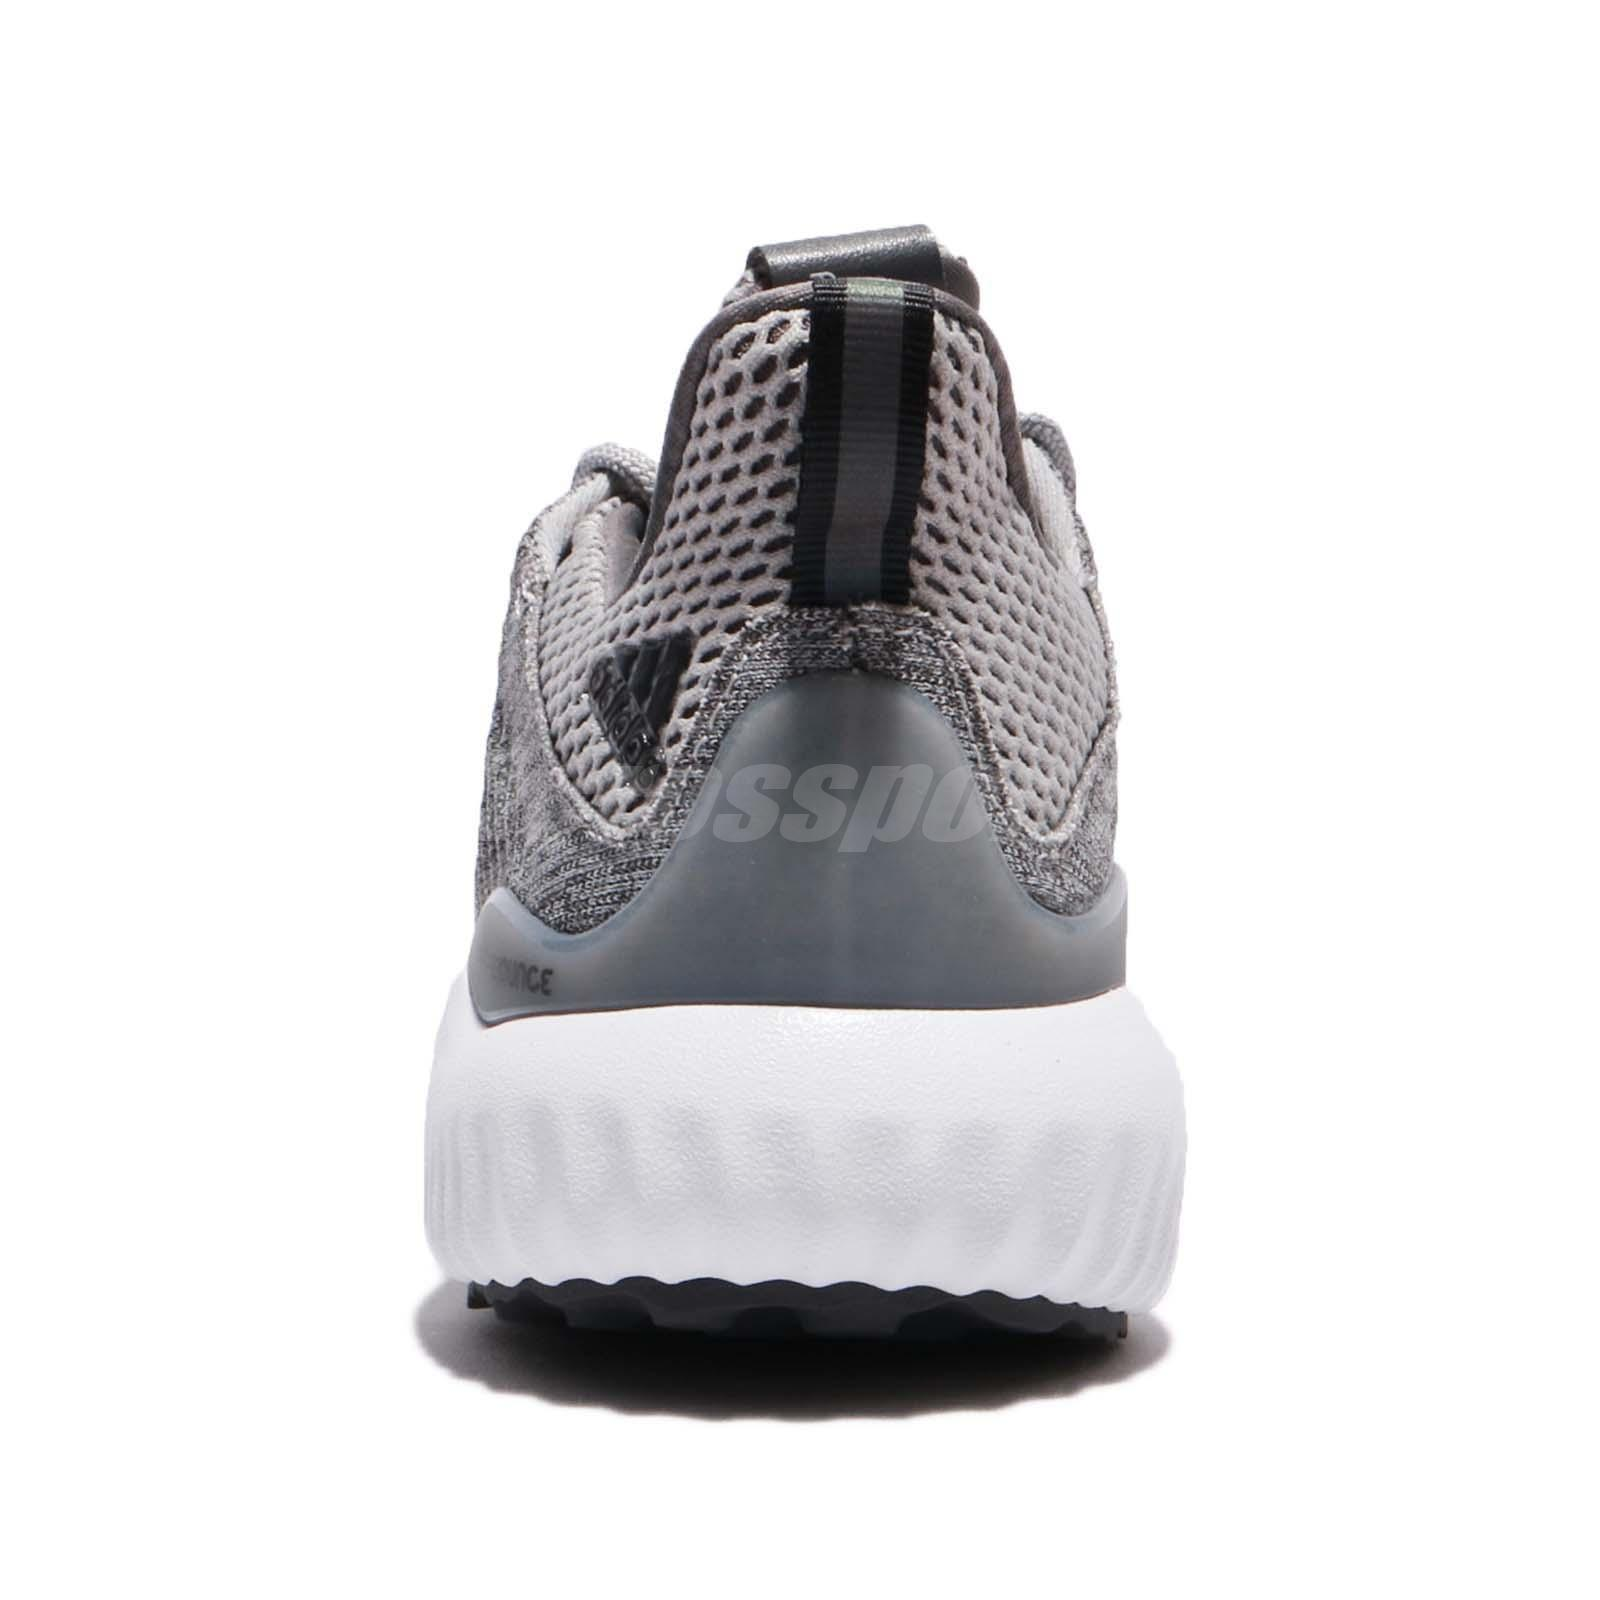 8ff593c807249 adidas Alphabounce EM W Engineered Mesh Grey White Women Running ...